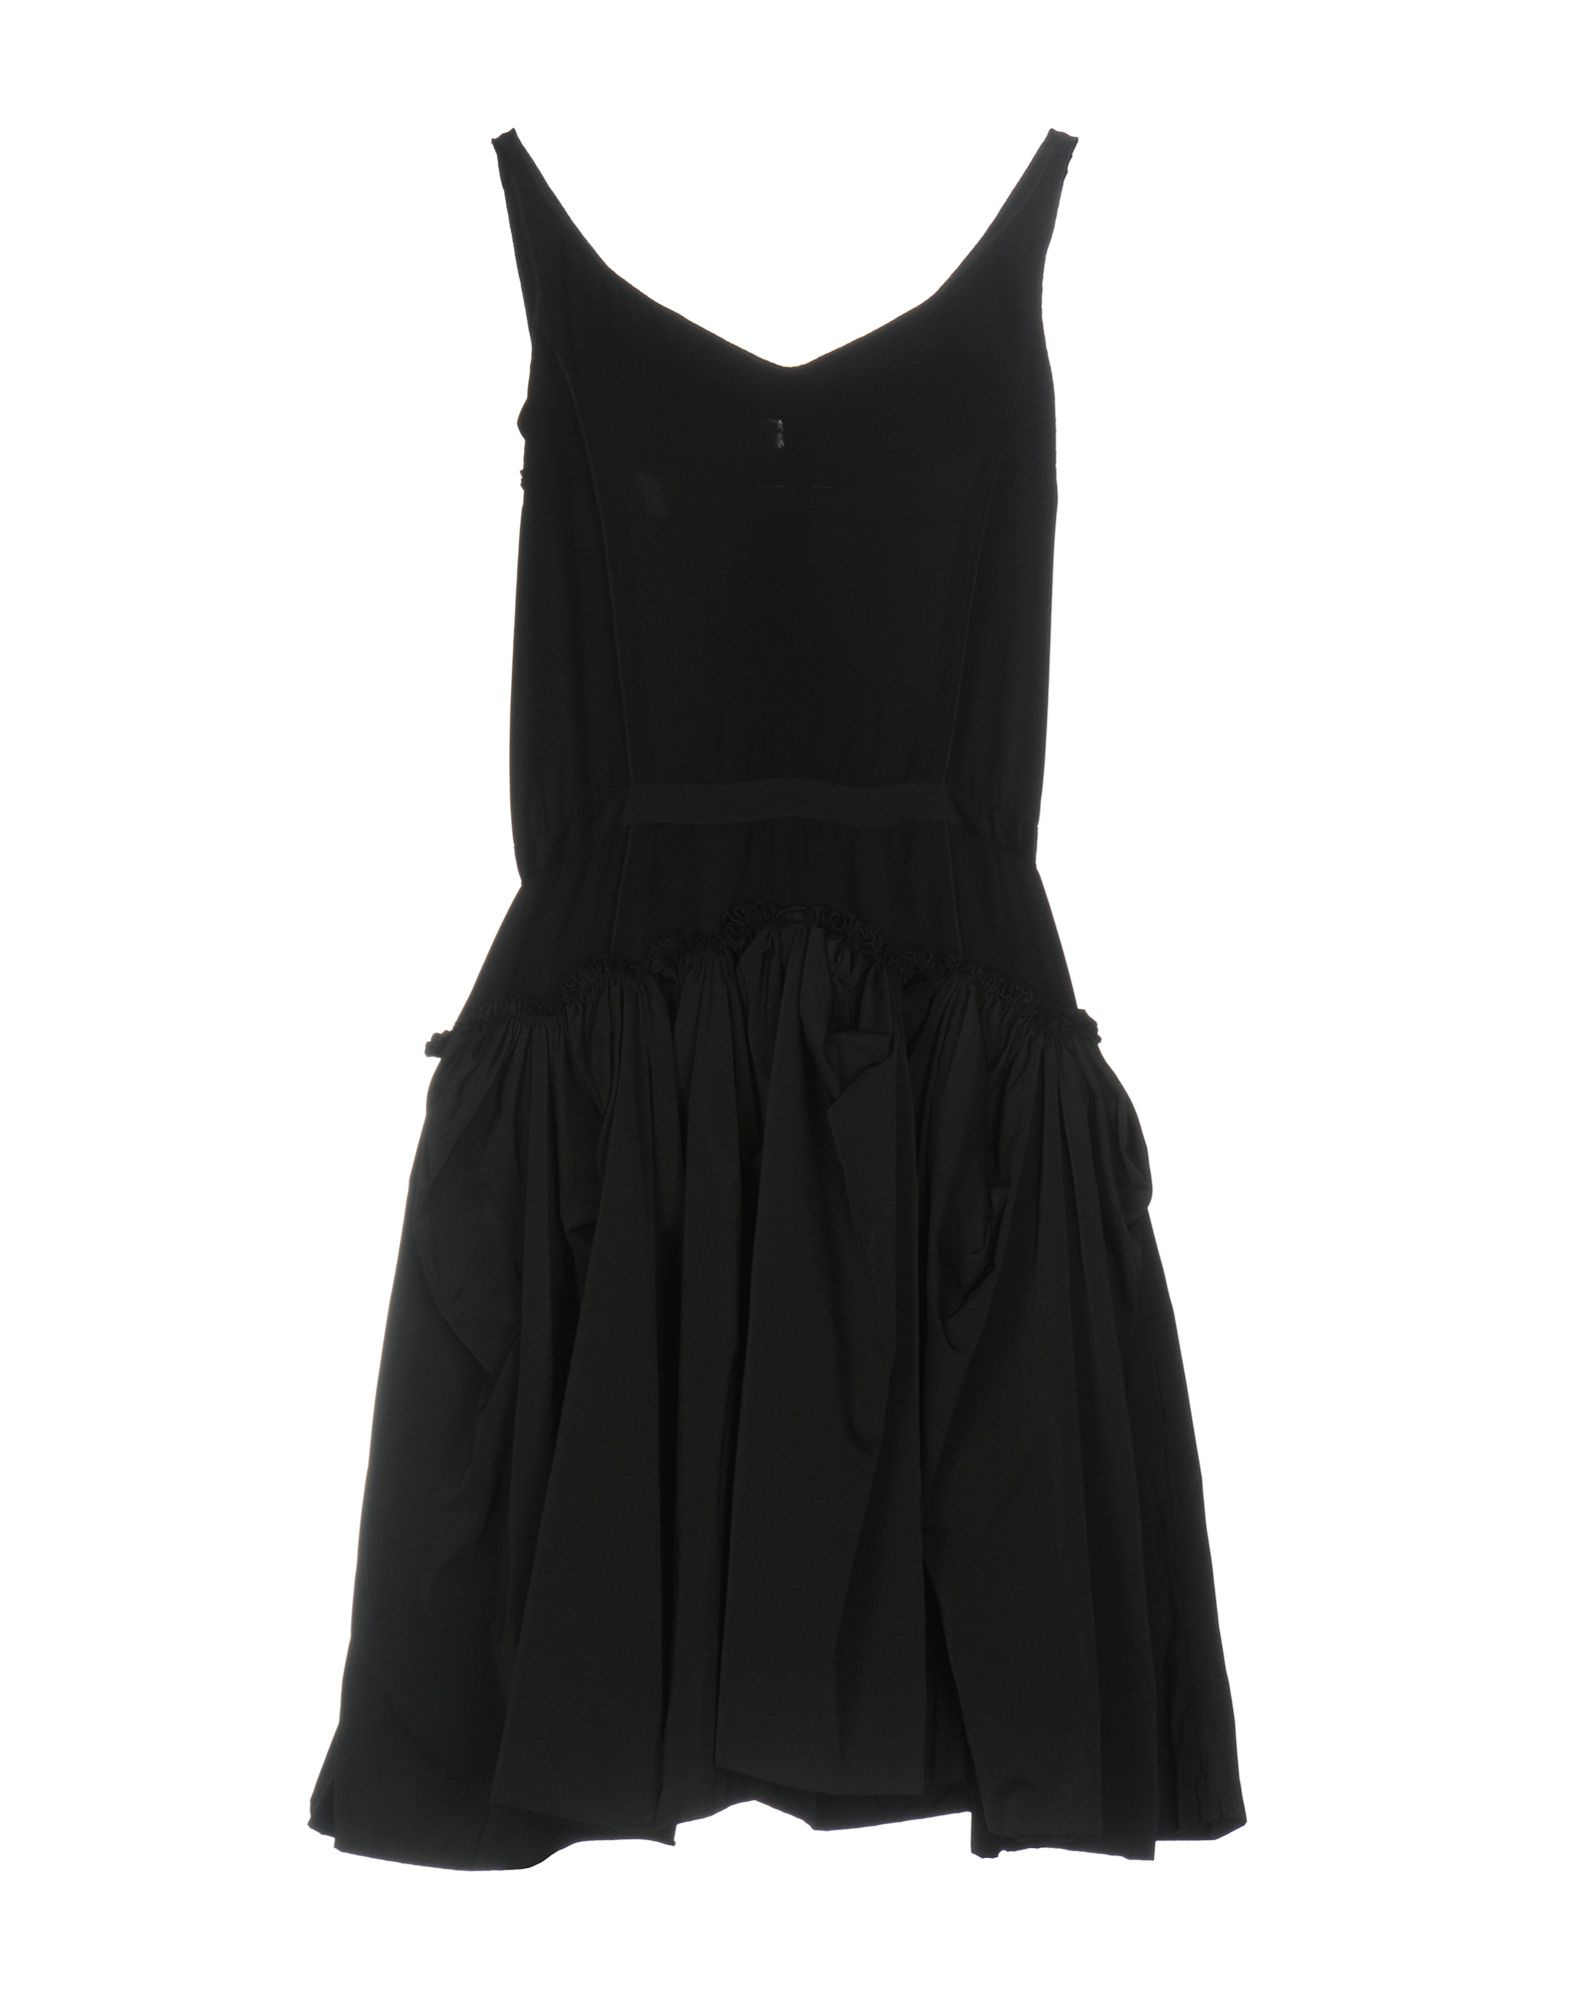 NINA RICCI Короткое платье nina ricci платье nina ricci 26687 черный